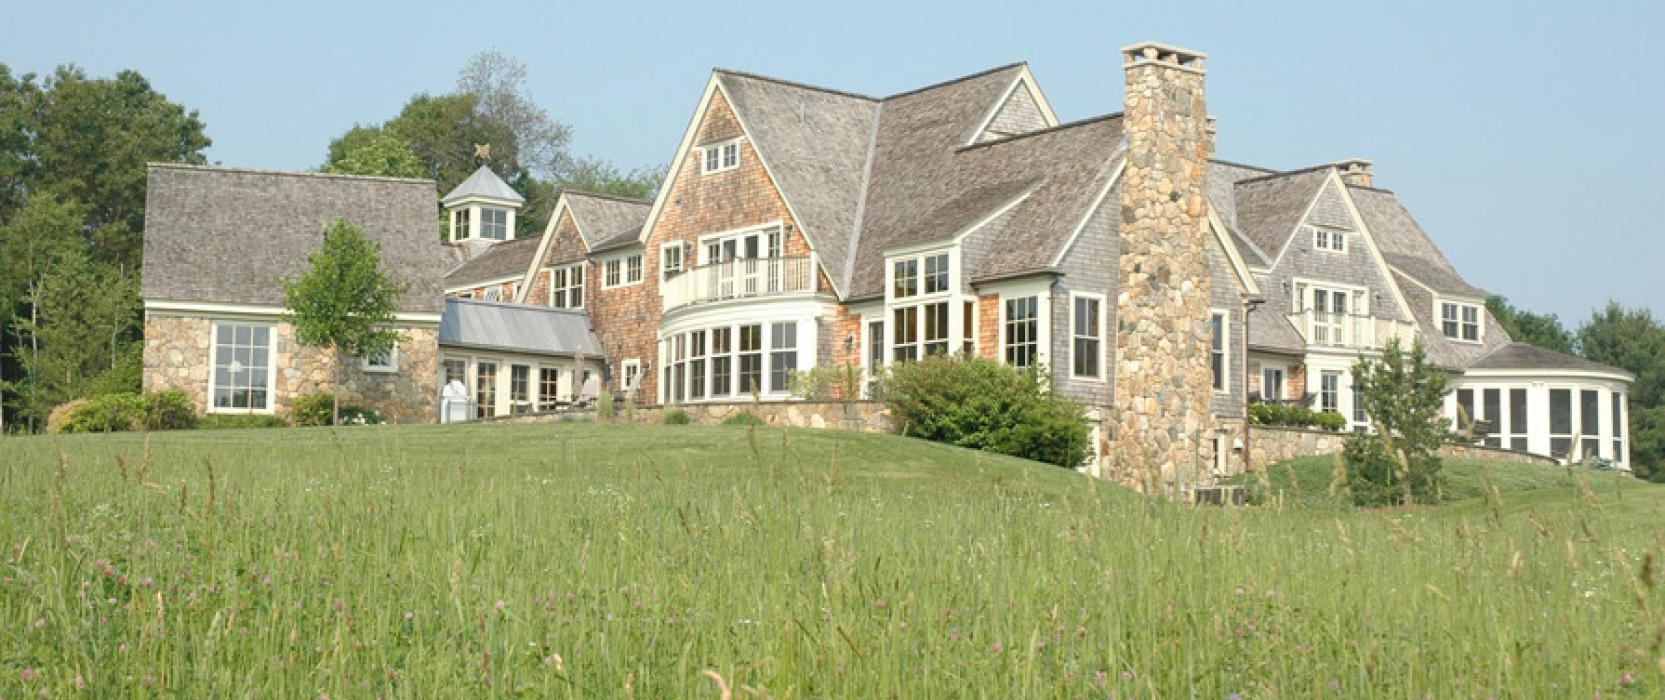 Featured Home: Ten-Acre Meadows